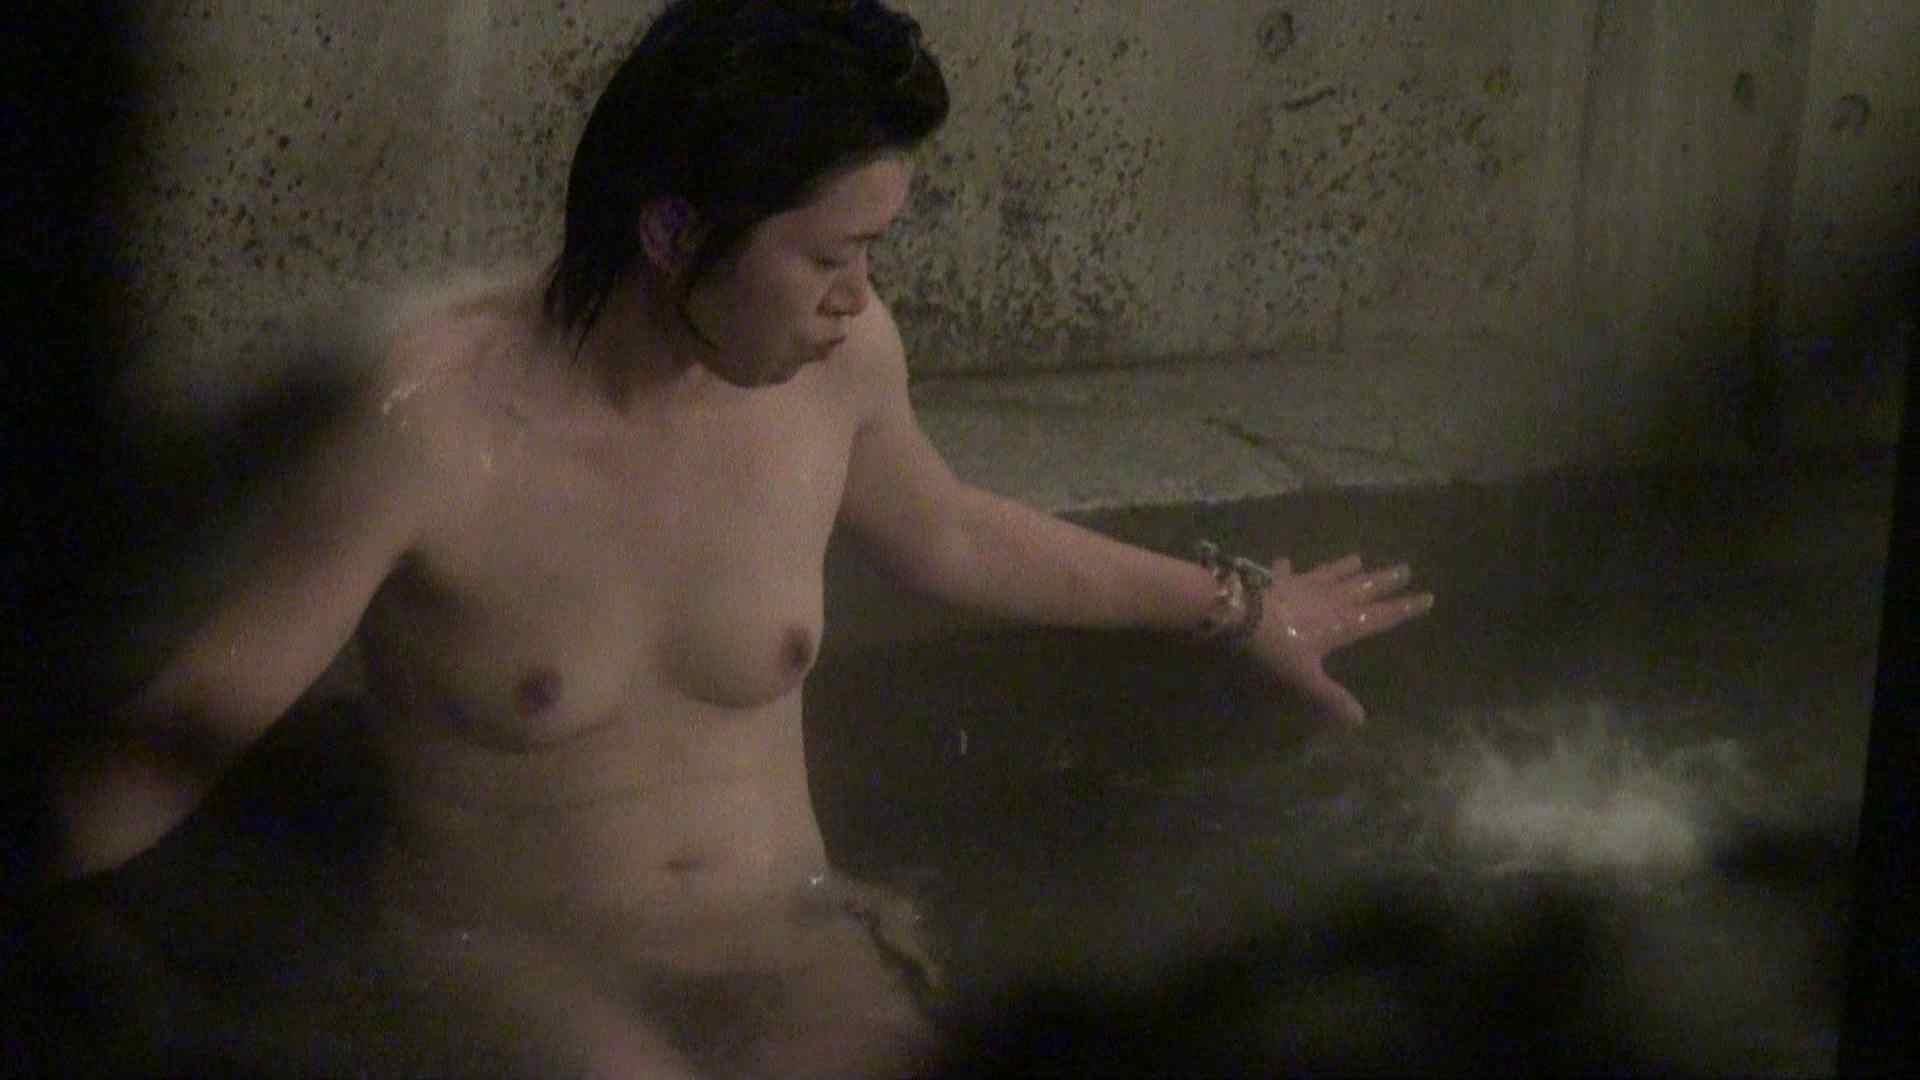 Aquaな露天風呂Vol.409 0   0  99連発 59